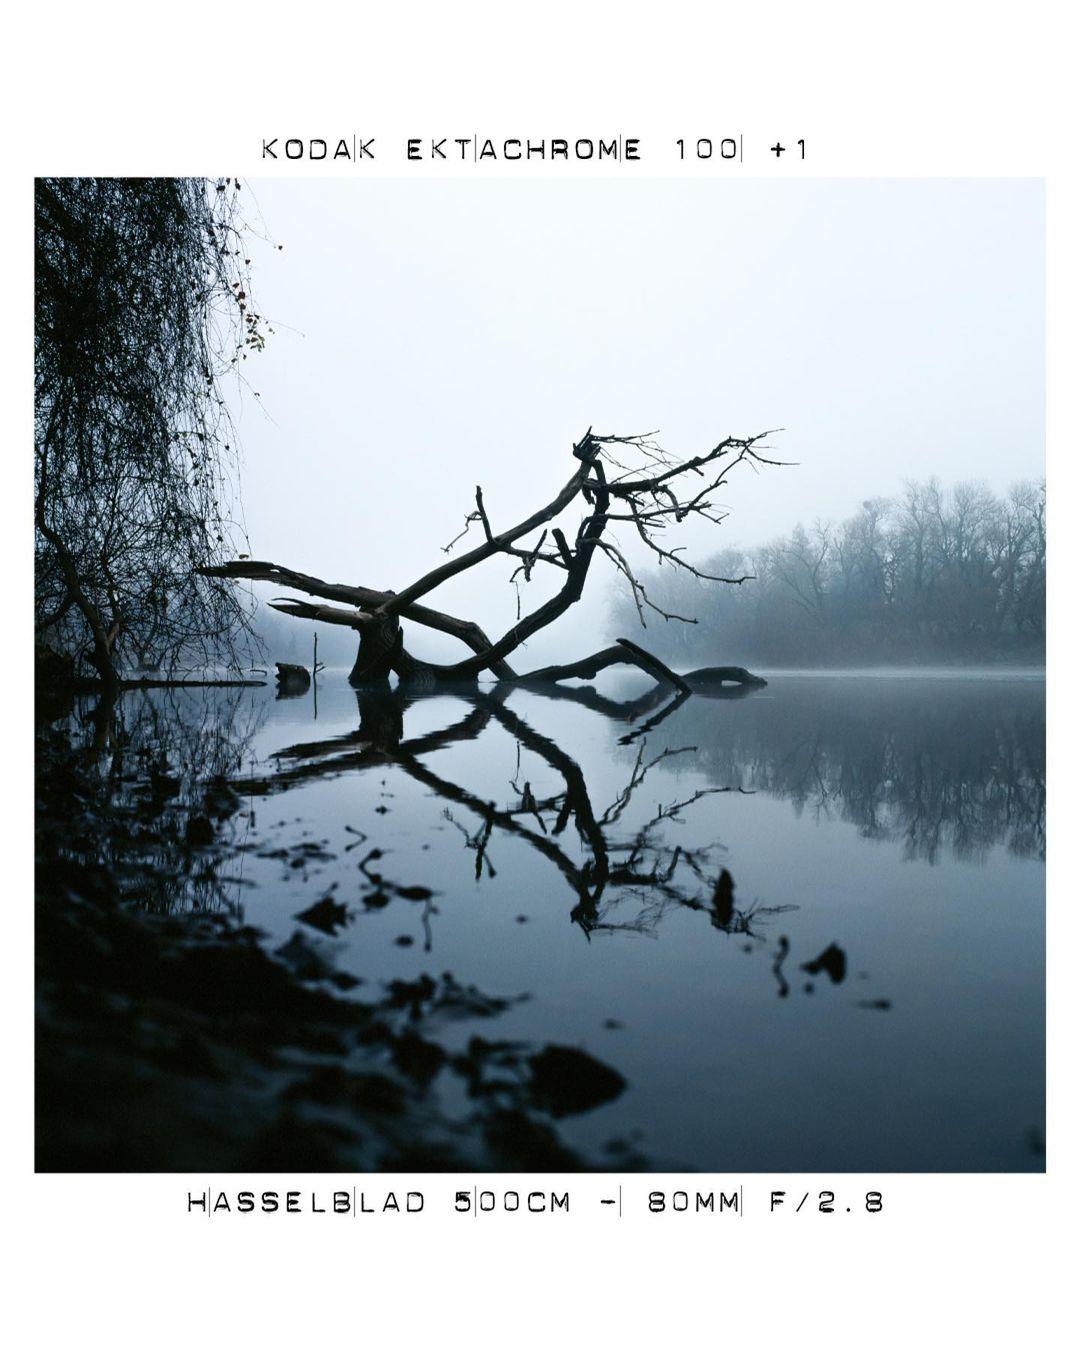 Kodak Ektachrome 100 +1, Hasselblad 500CM - 80MM F/2.8